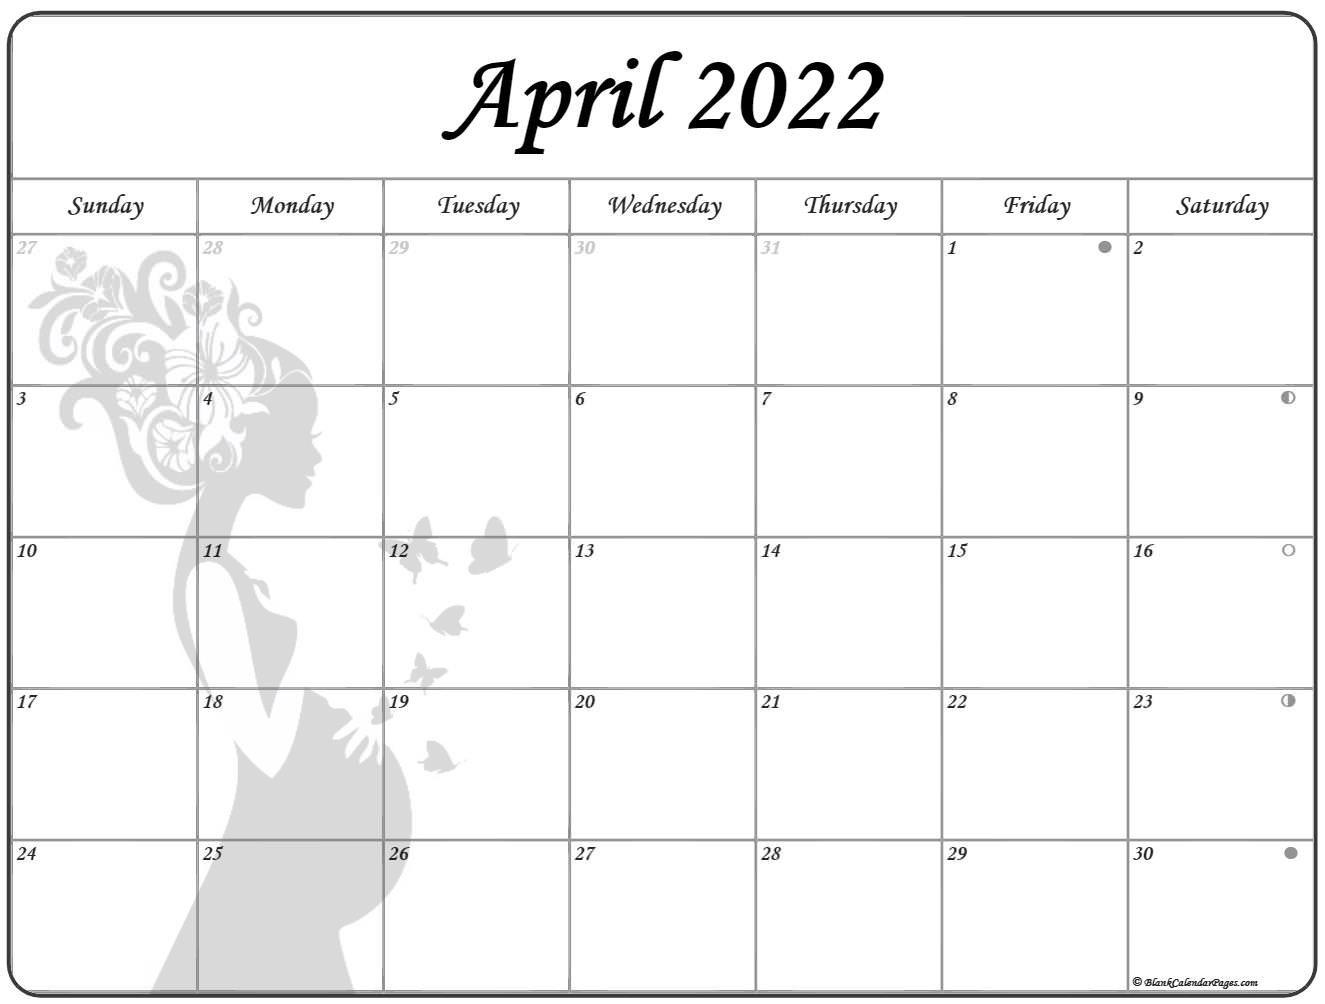 April 2022 Pregnancy Calendar   Fertility Calendar intended for April 2022 Printable Calendar Free 2022